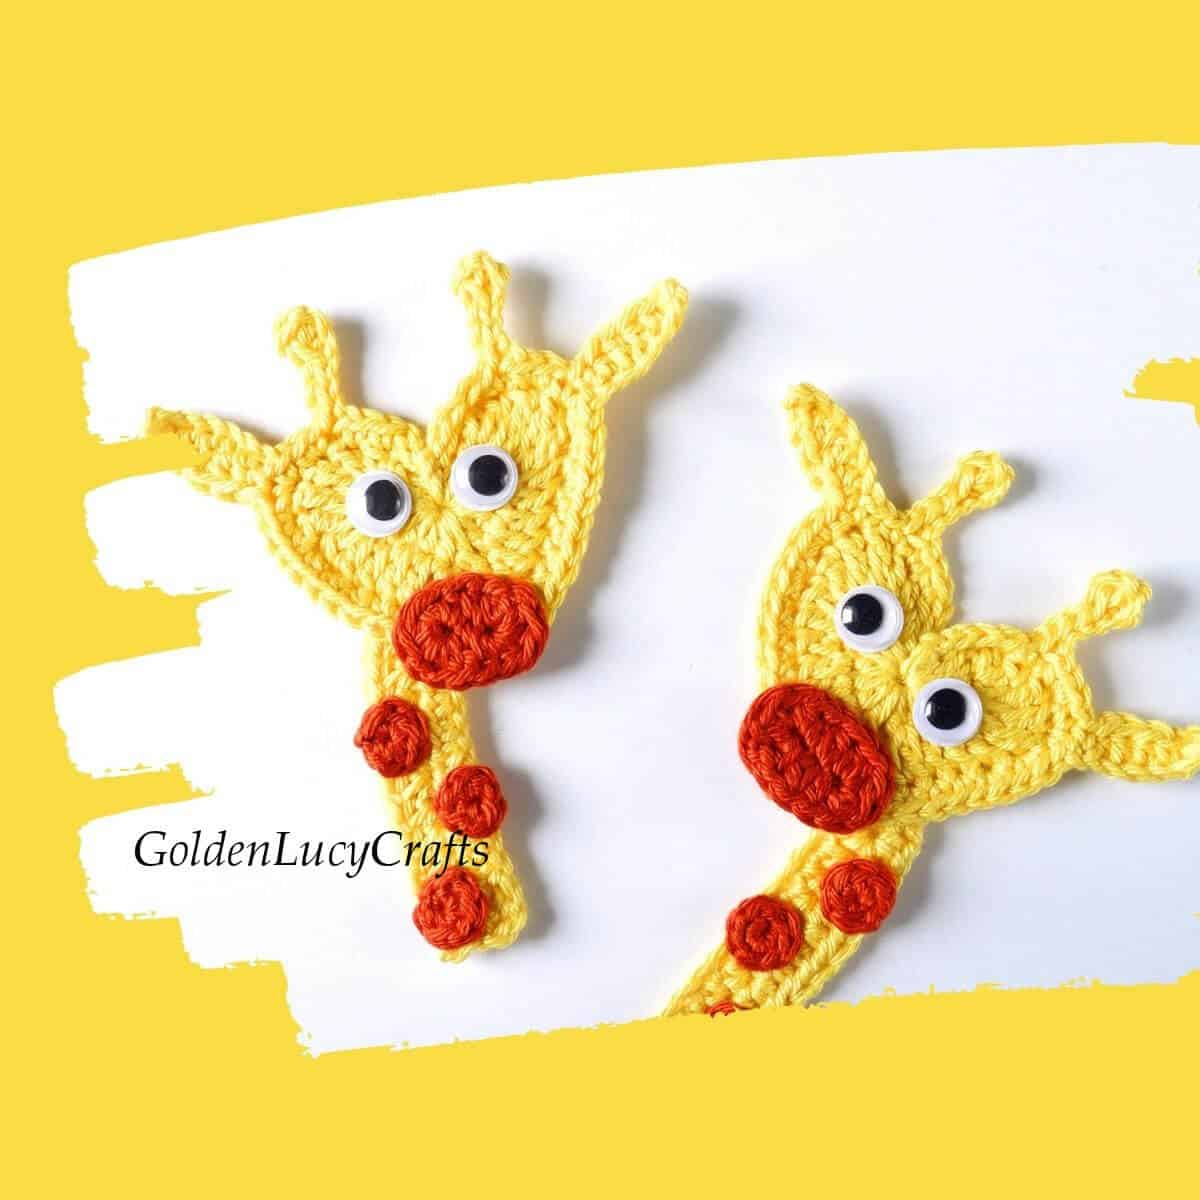 Two crocheted giraffe appliques.